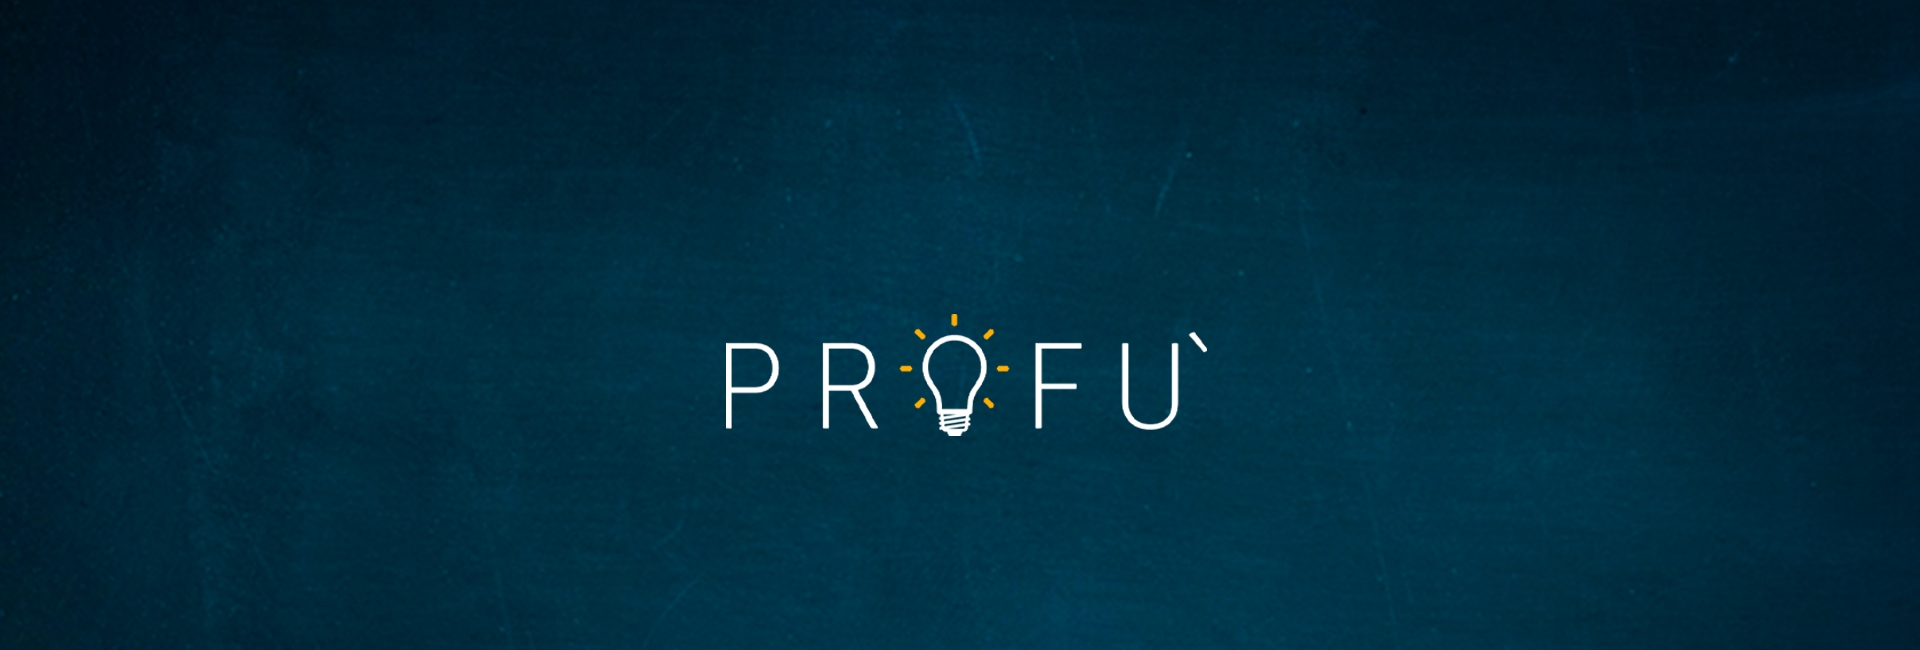 PROFU'